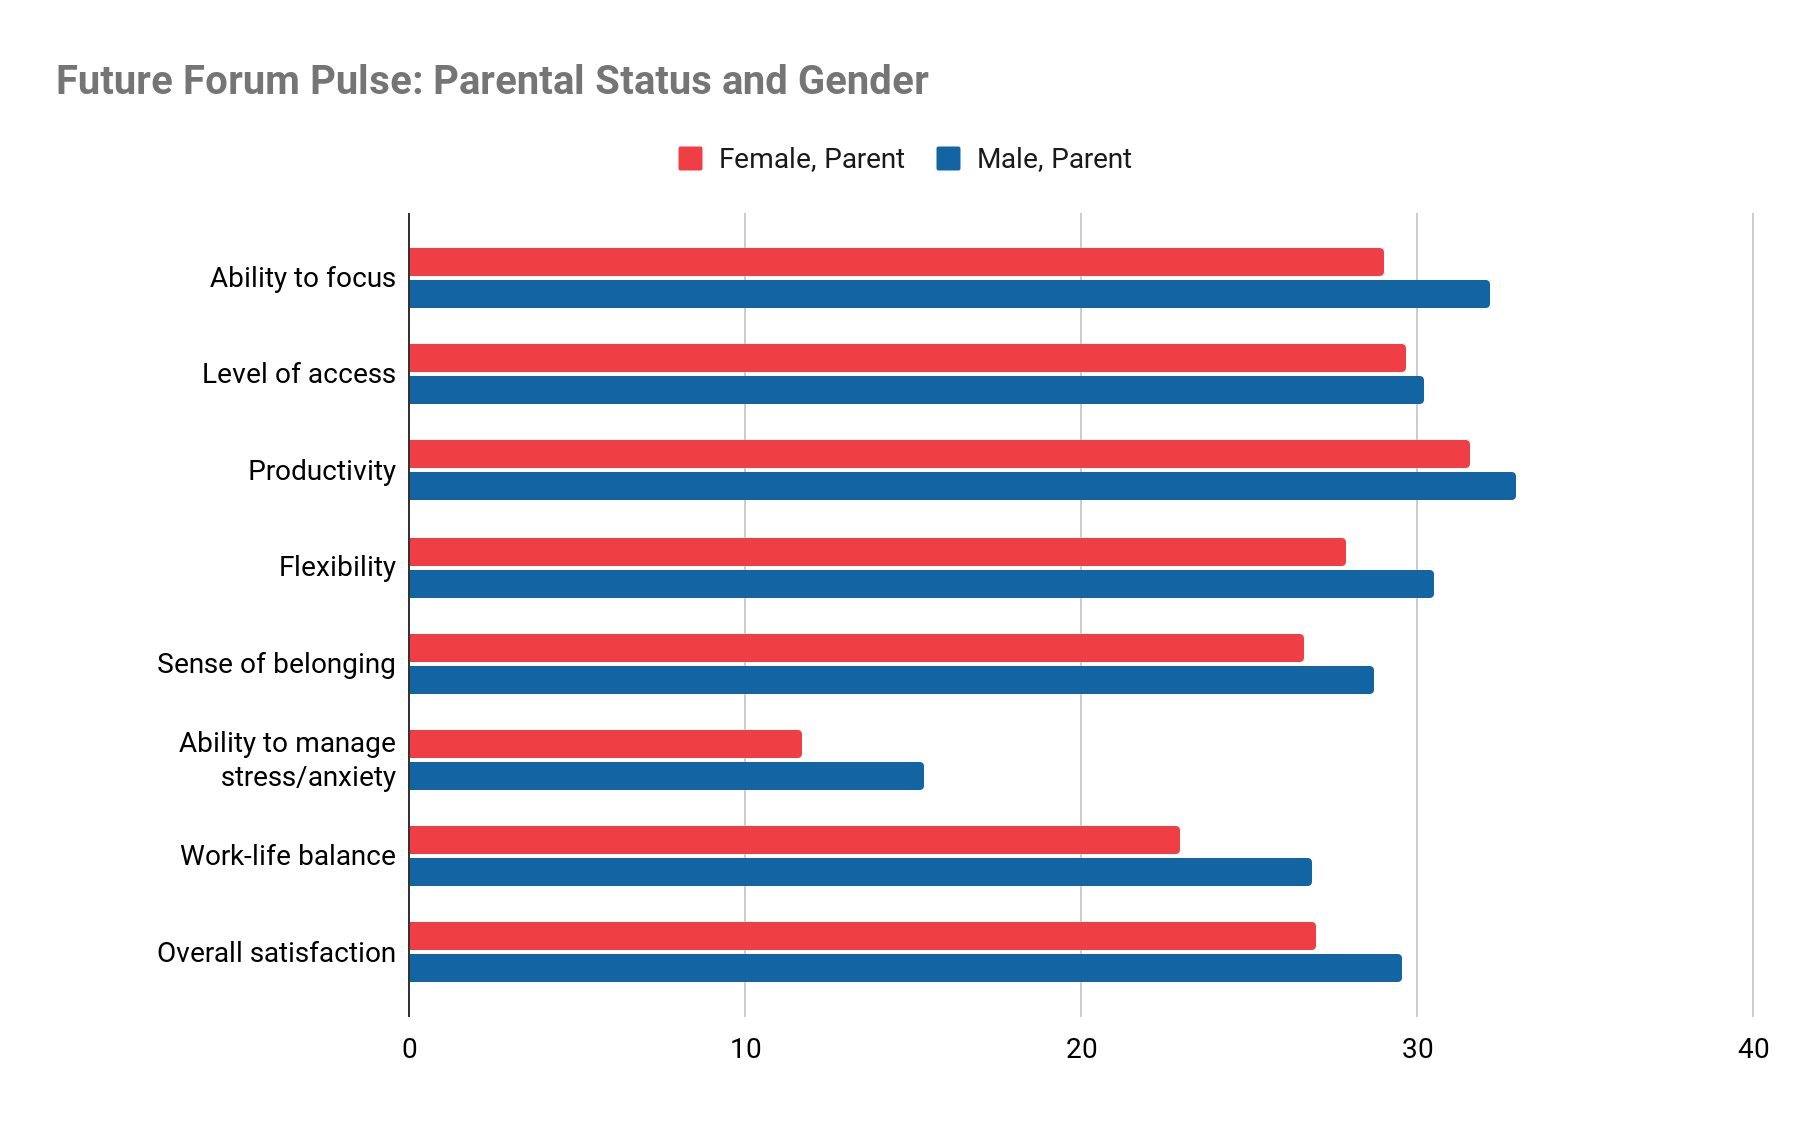 Future Forum Pulse findings, split by gender and parental status